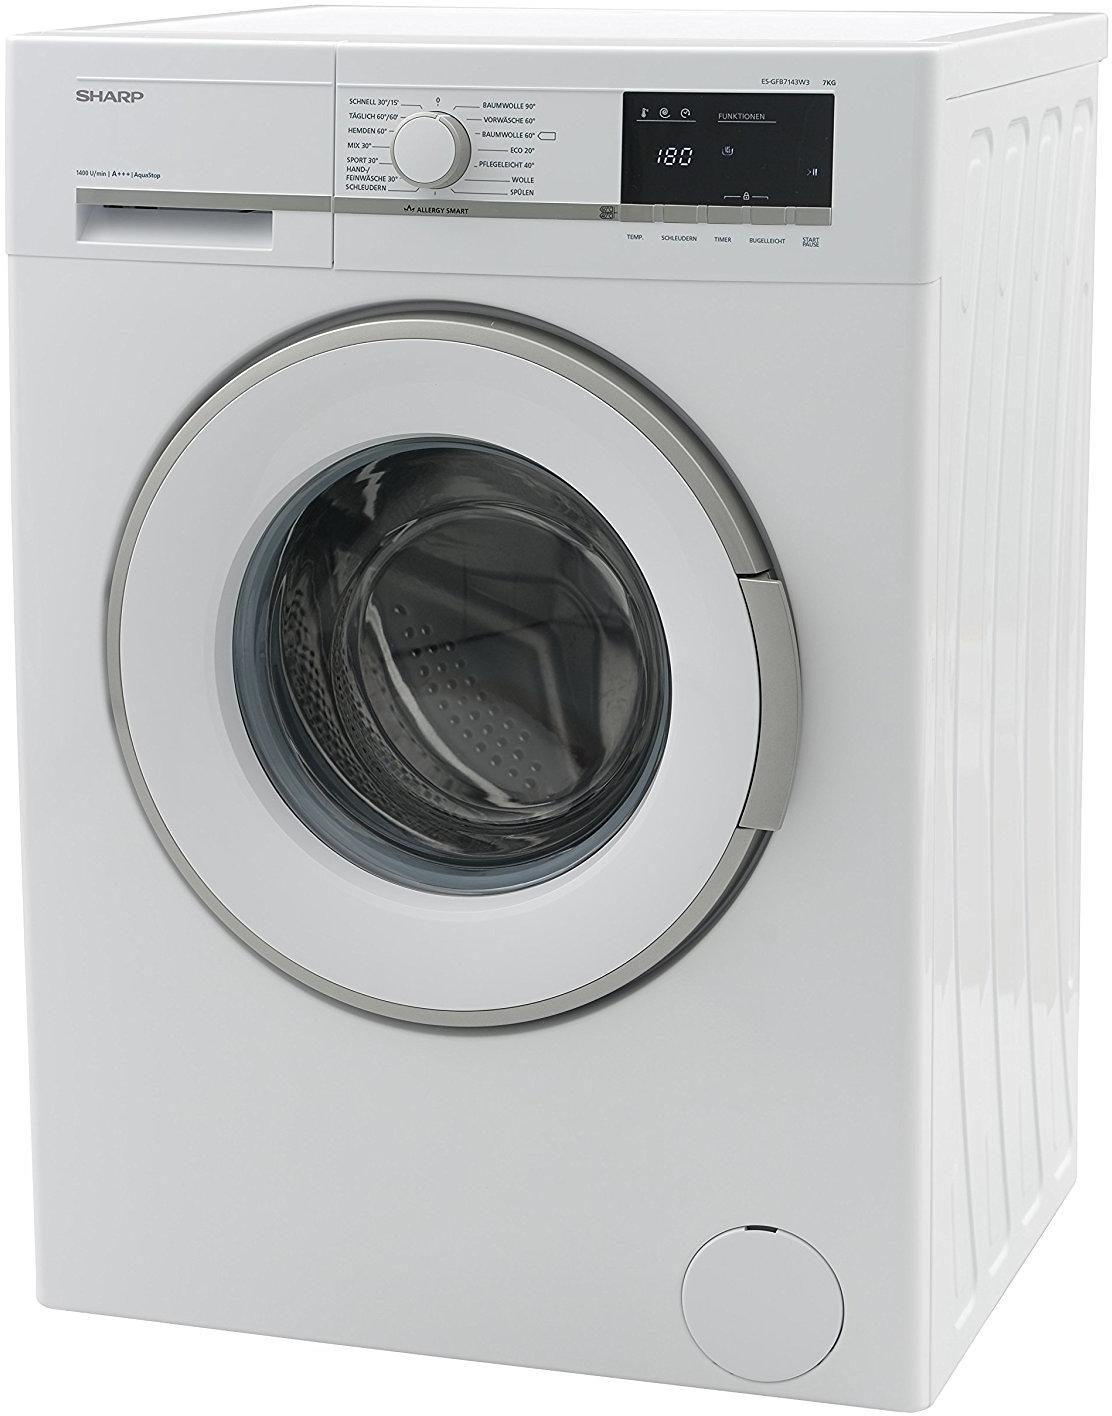 sharp es gfb7143w3 de 7 kg a waschmaschine 1400 u min aquastop led display von sharp. Black Bedroom Furniture Sets. Home Design Ideas